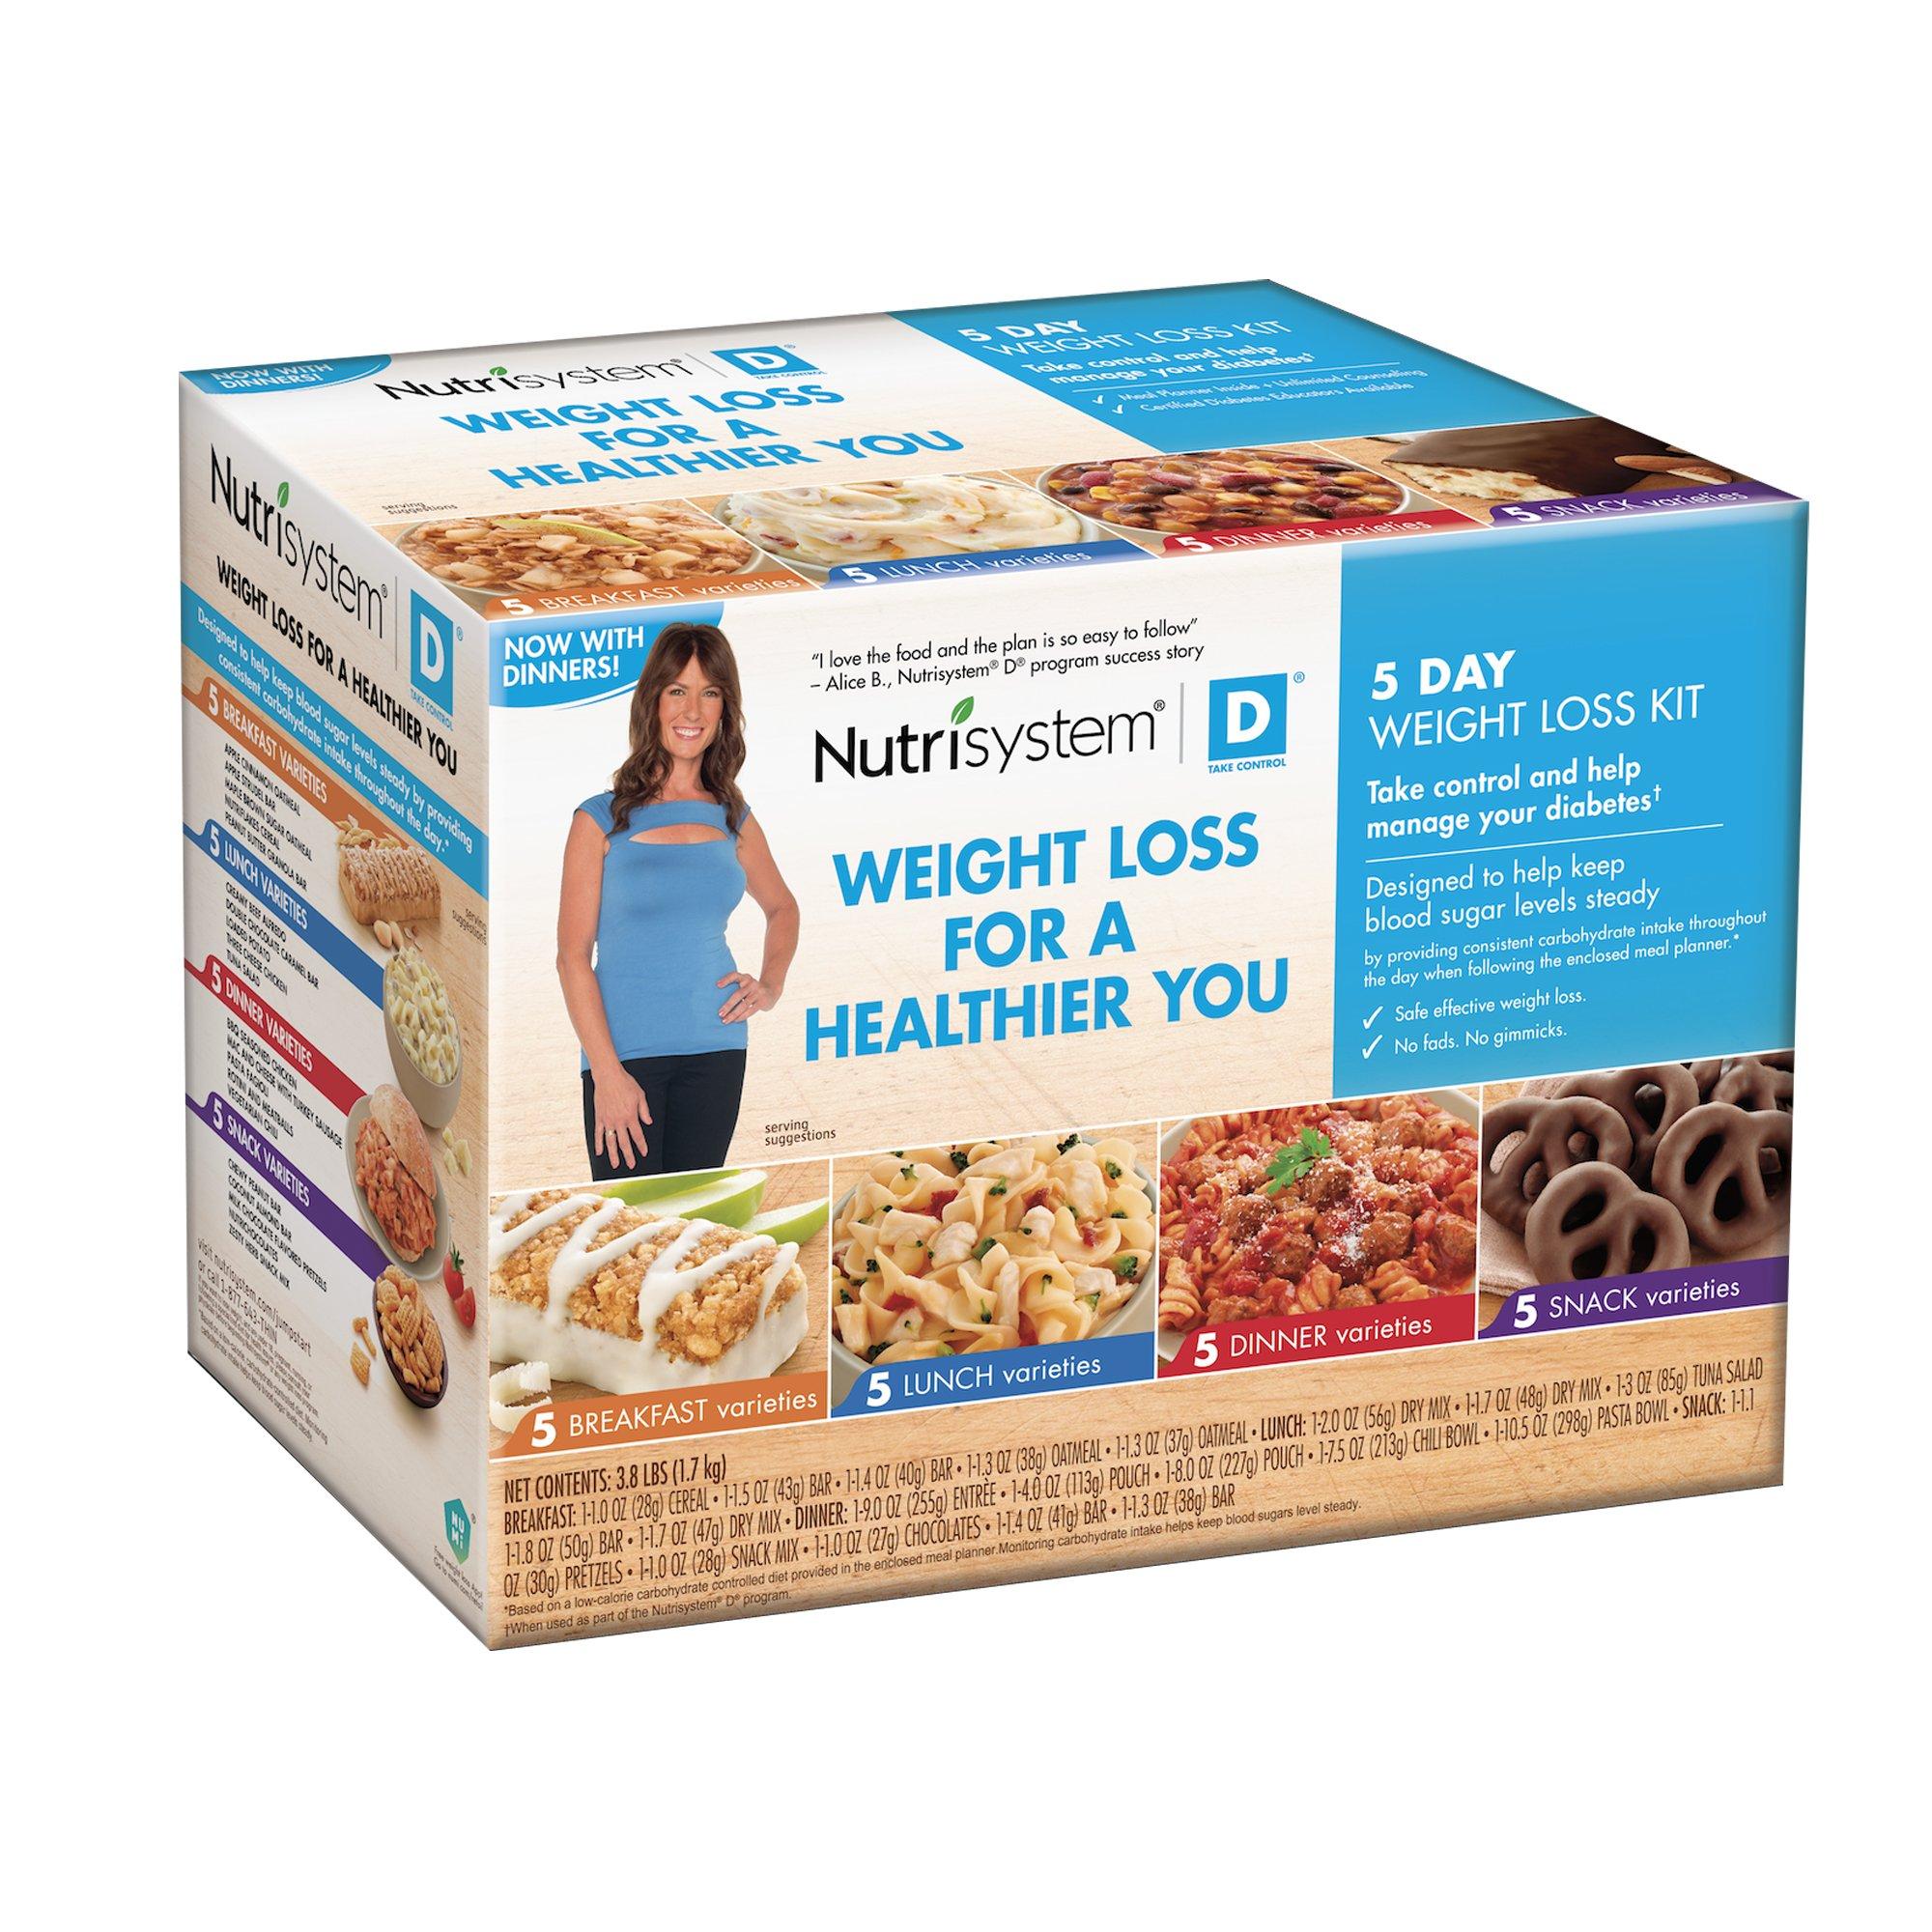 Nutrisystem D 5 Day Weight Loss Kit Diabetic Kit Now